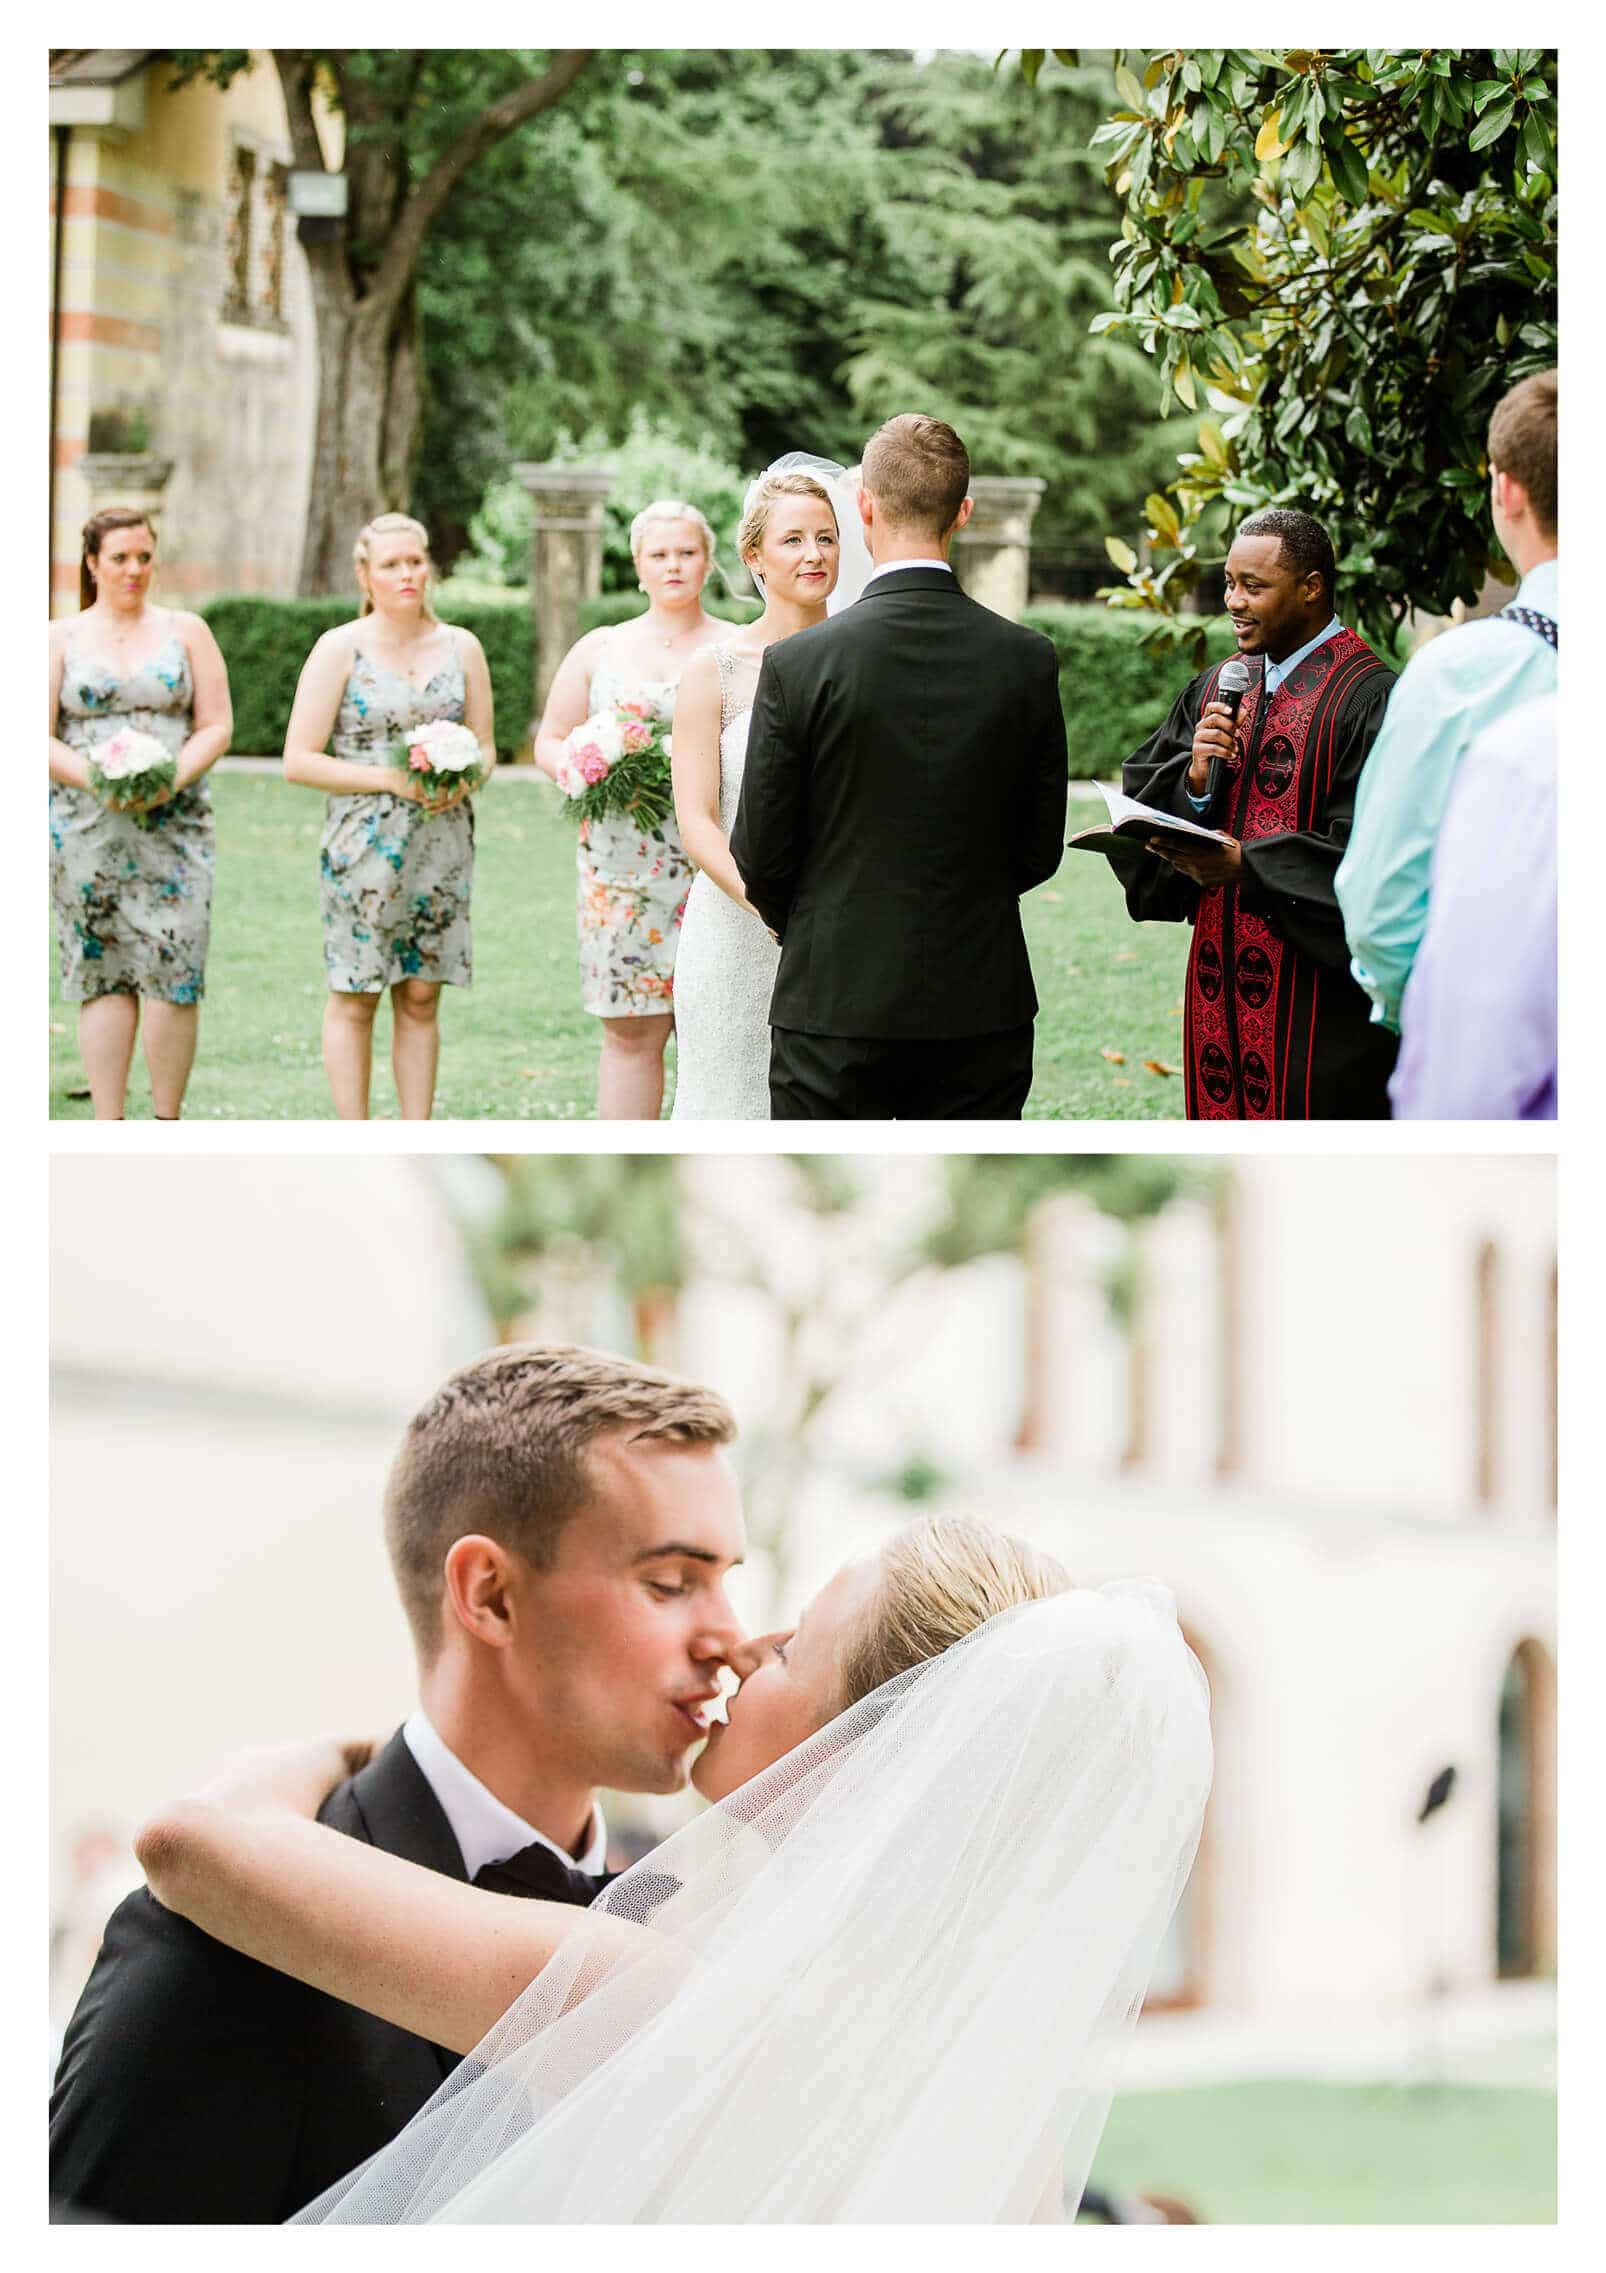 First kiss wedding ceremony at Fossa Mala in Pordenone | Italy destination photographer